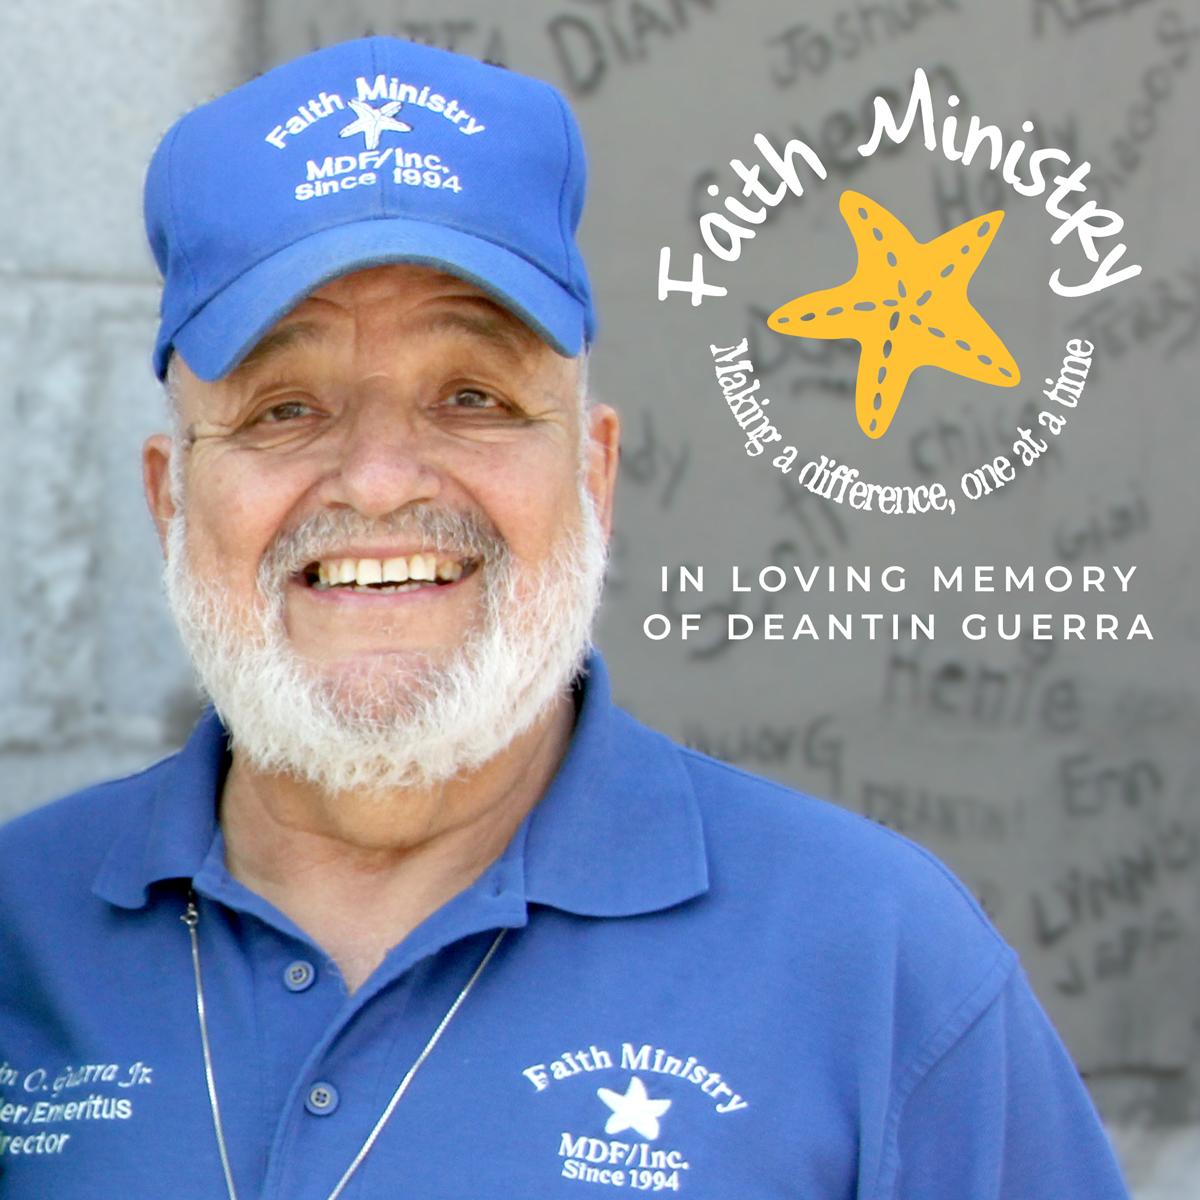 In Loving Memory of Deantin Guerra